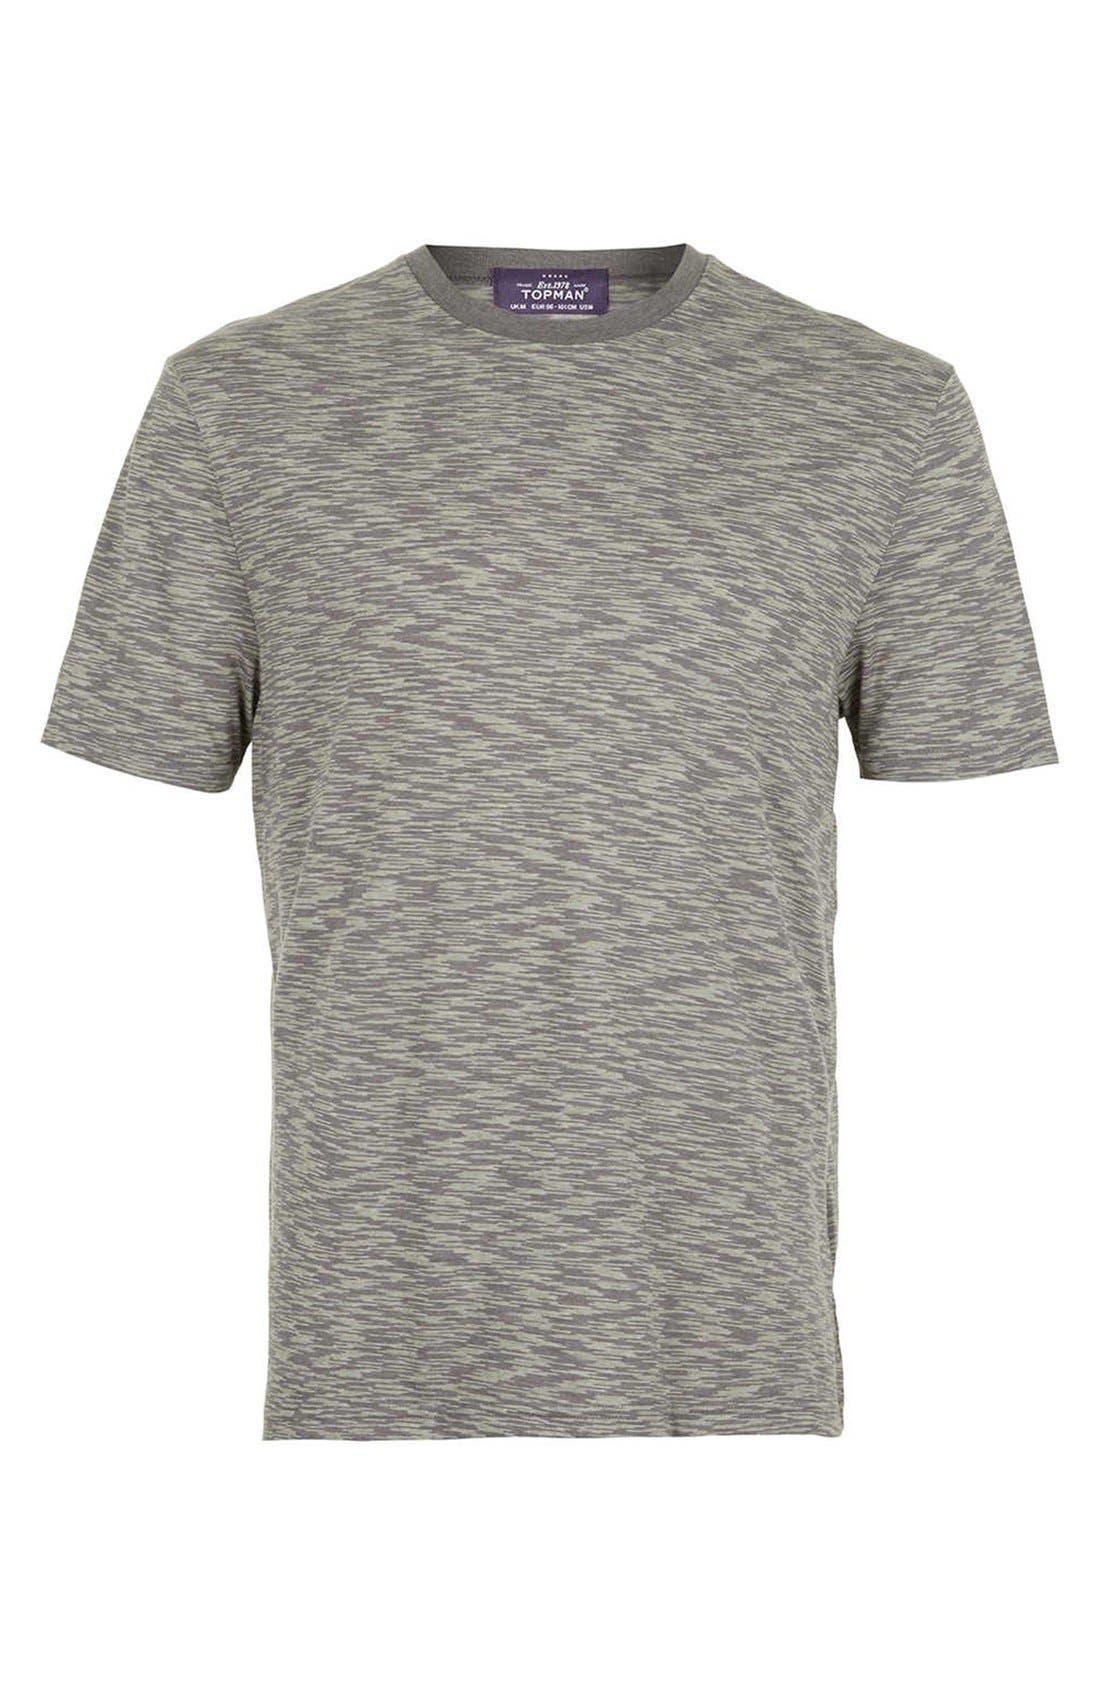 Alternate Image 1 Selected - Topman Space Dye T-Shirt